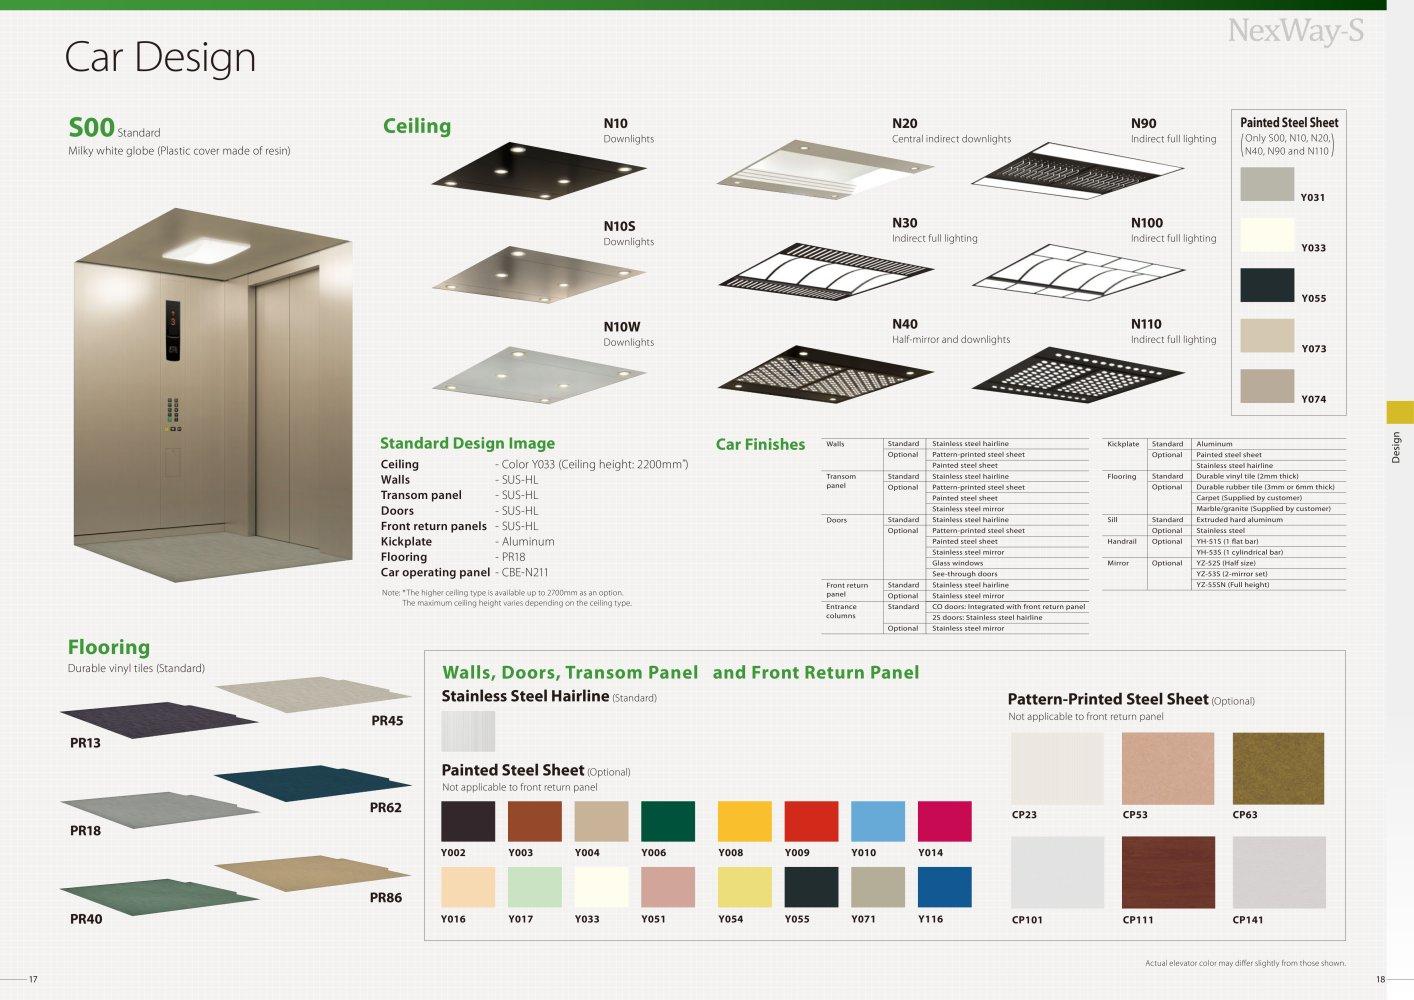 Design of a car pdf - Car Design 1 3 Pages